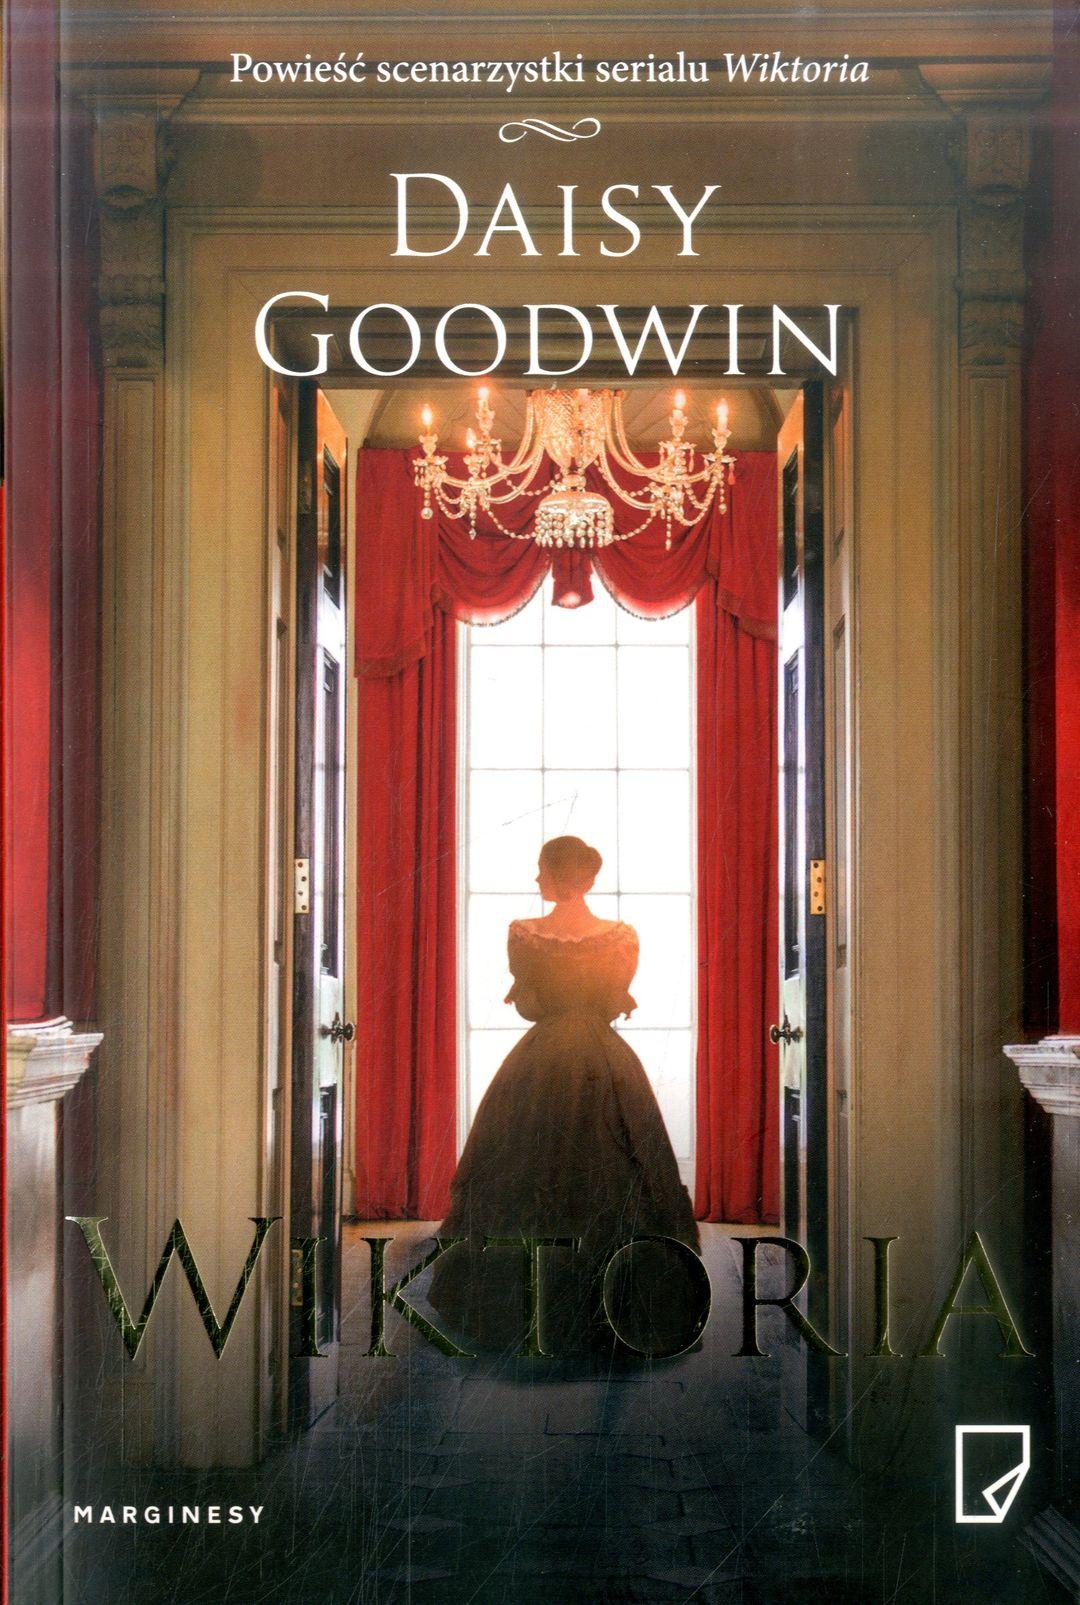 Goodwin Daisy – Wiktoria